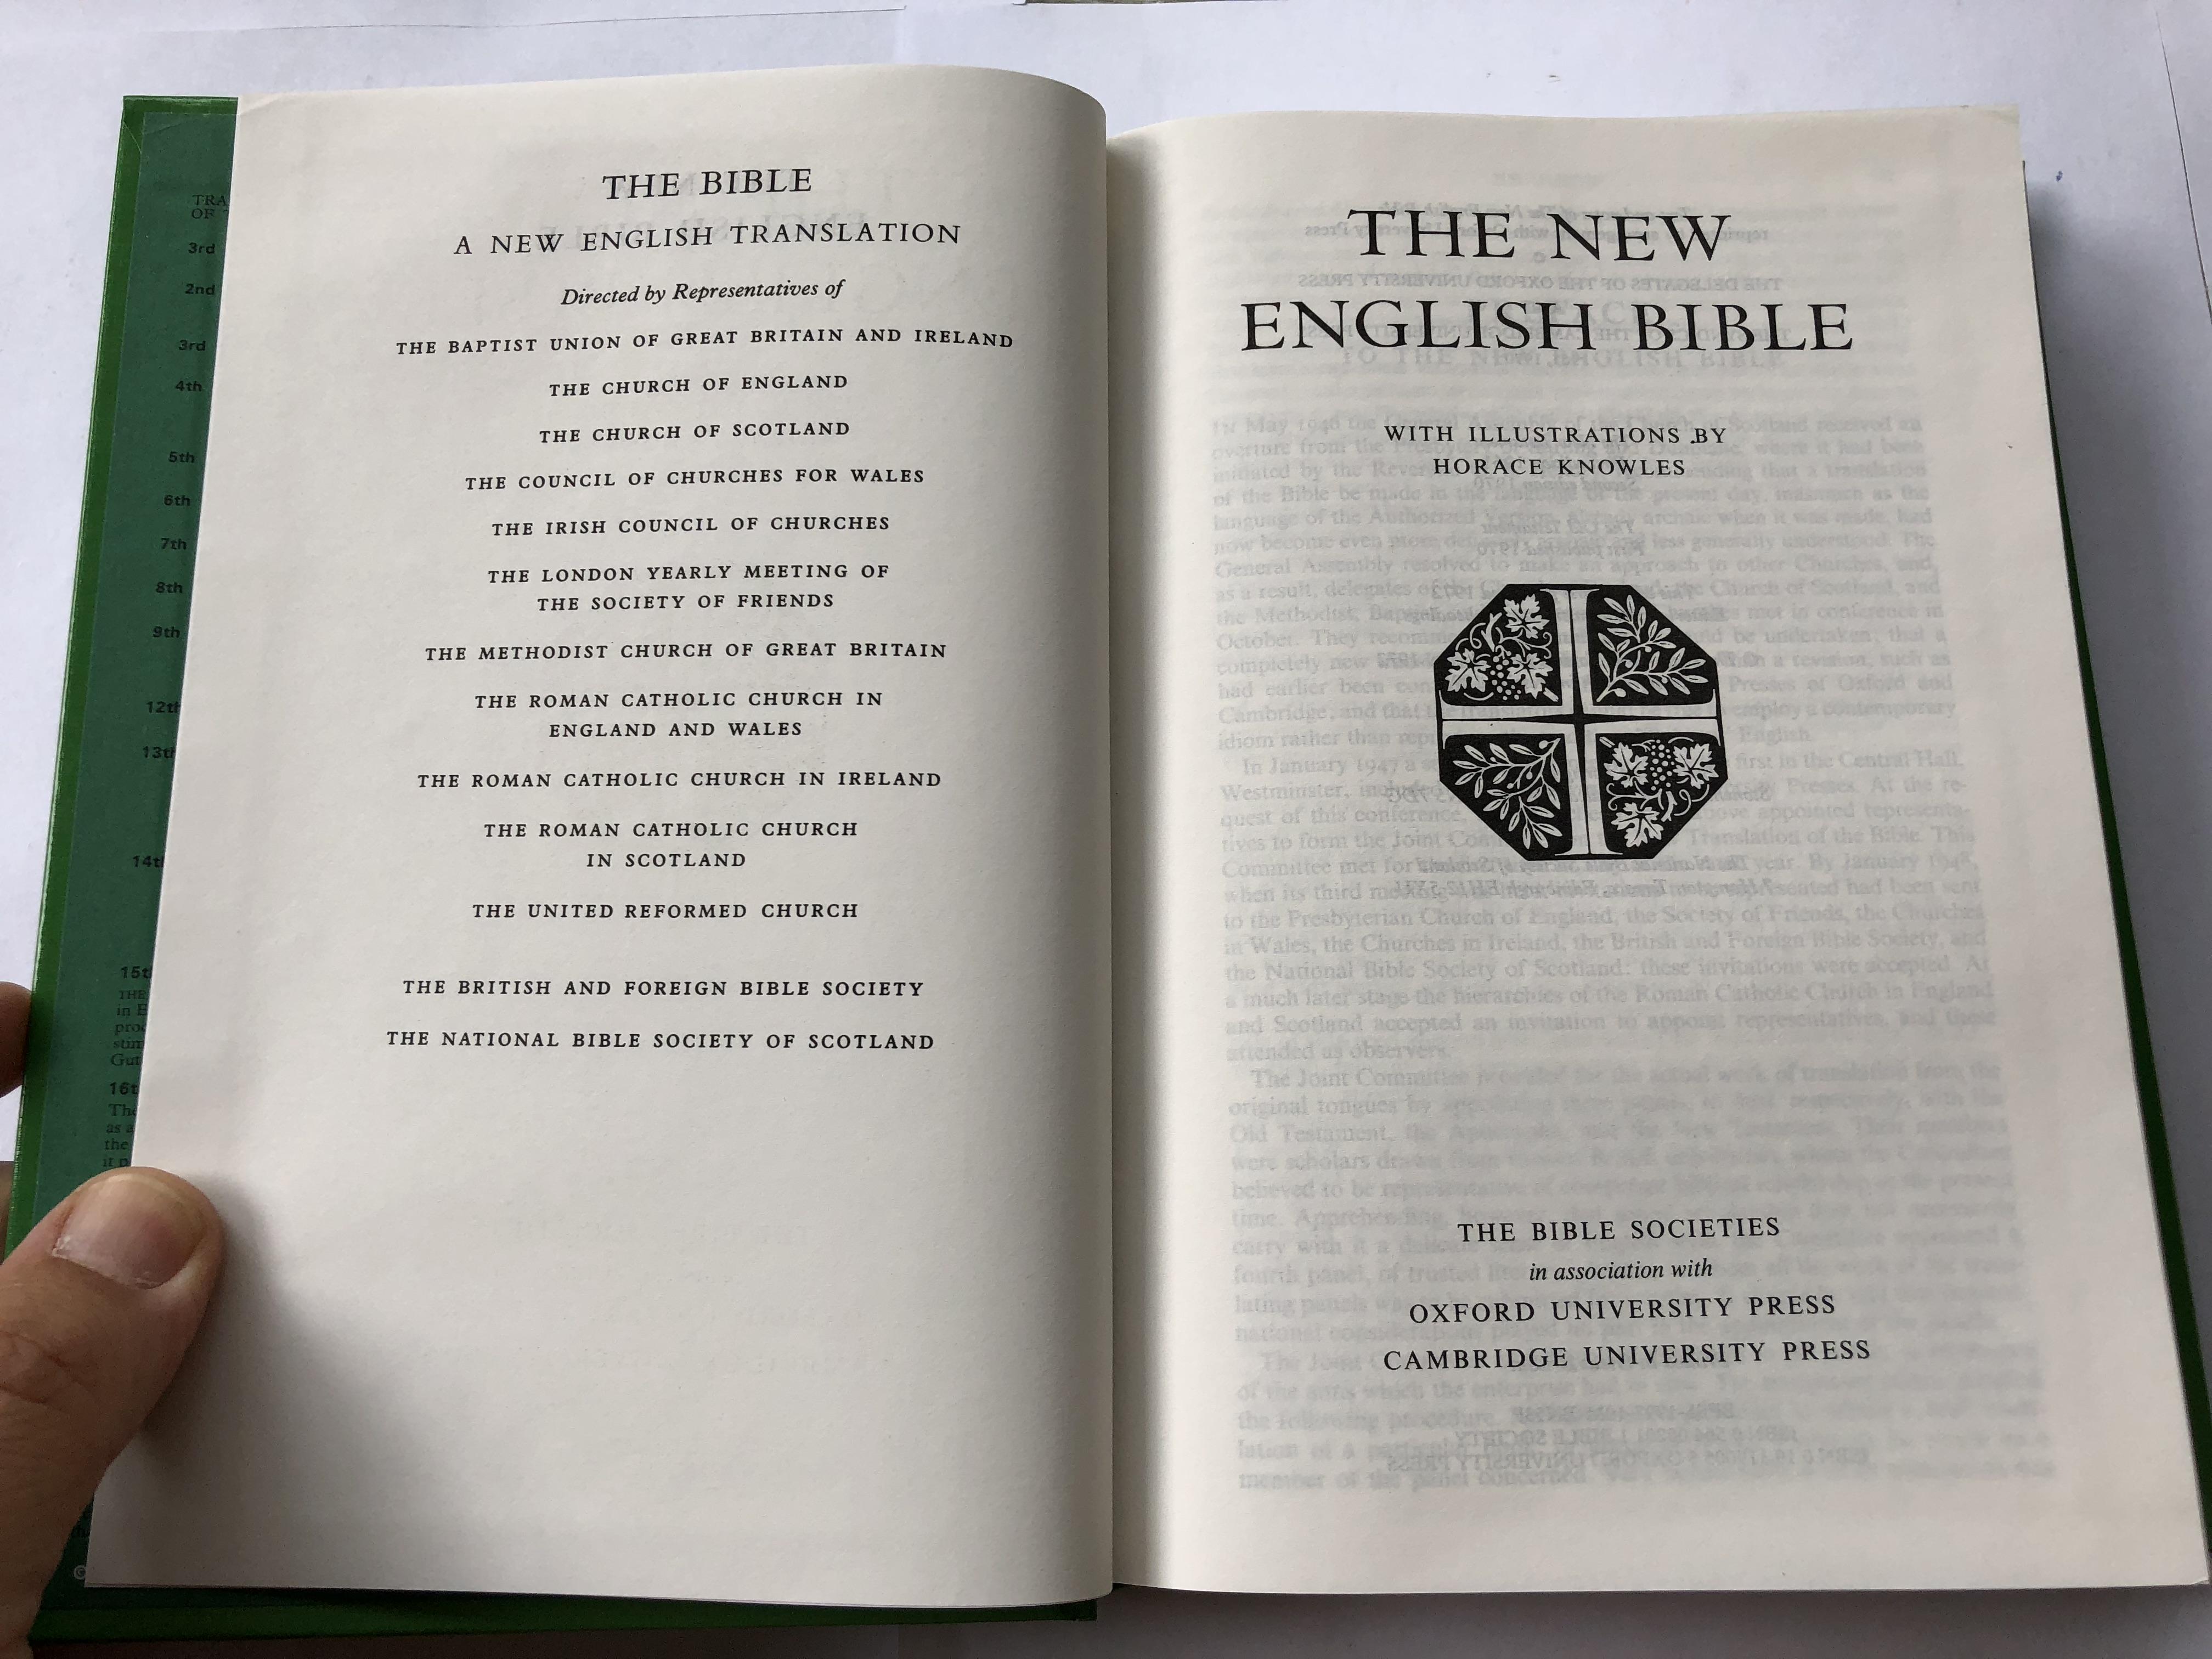 new-english-bible-5-.jpg